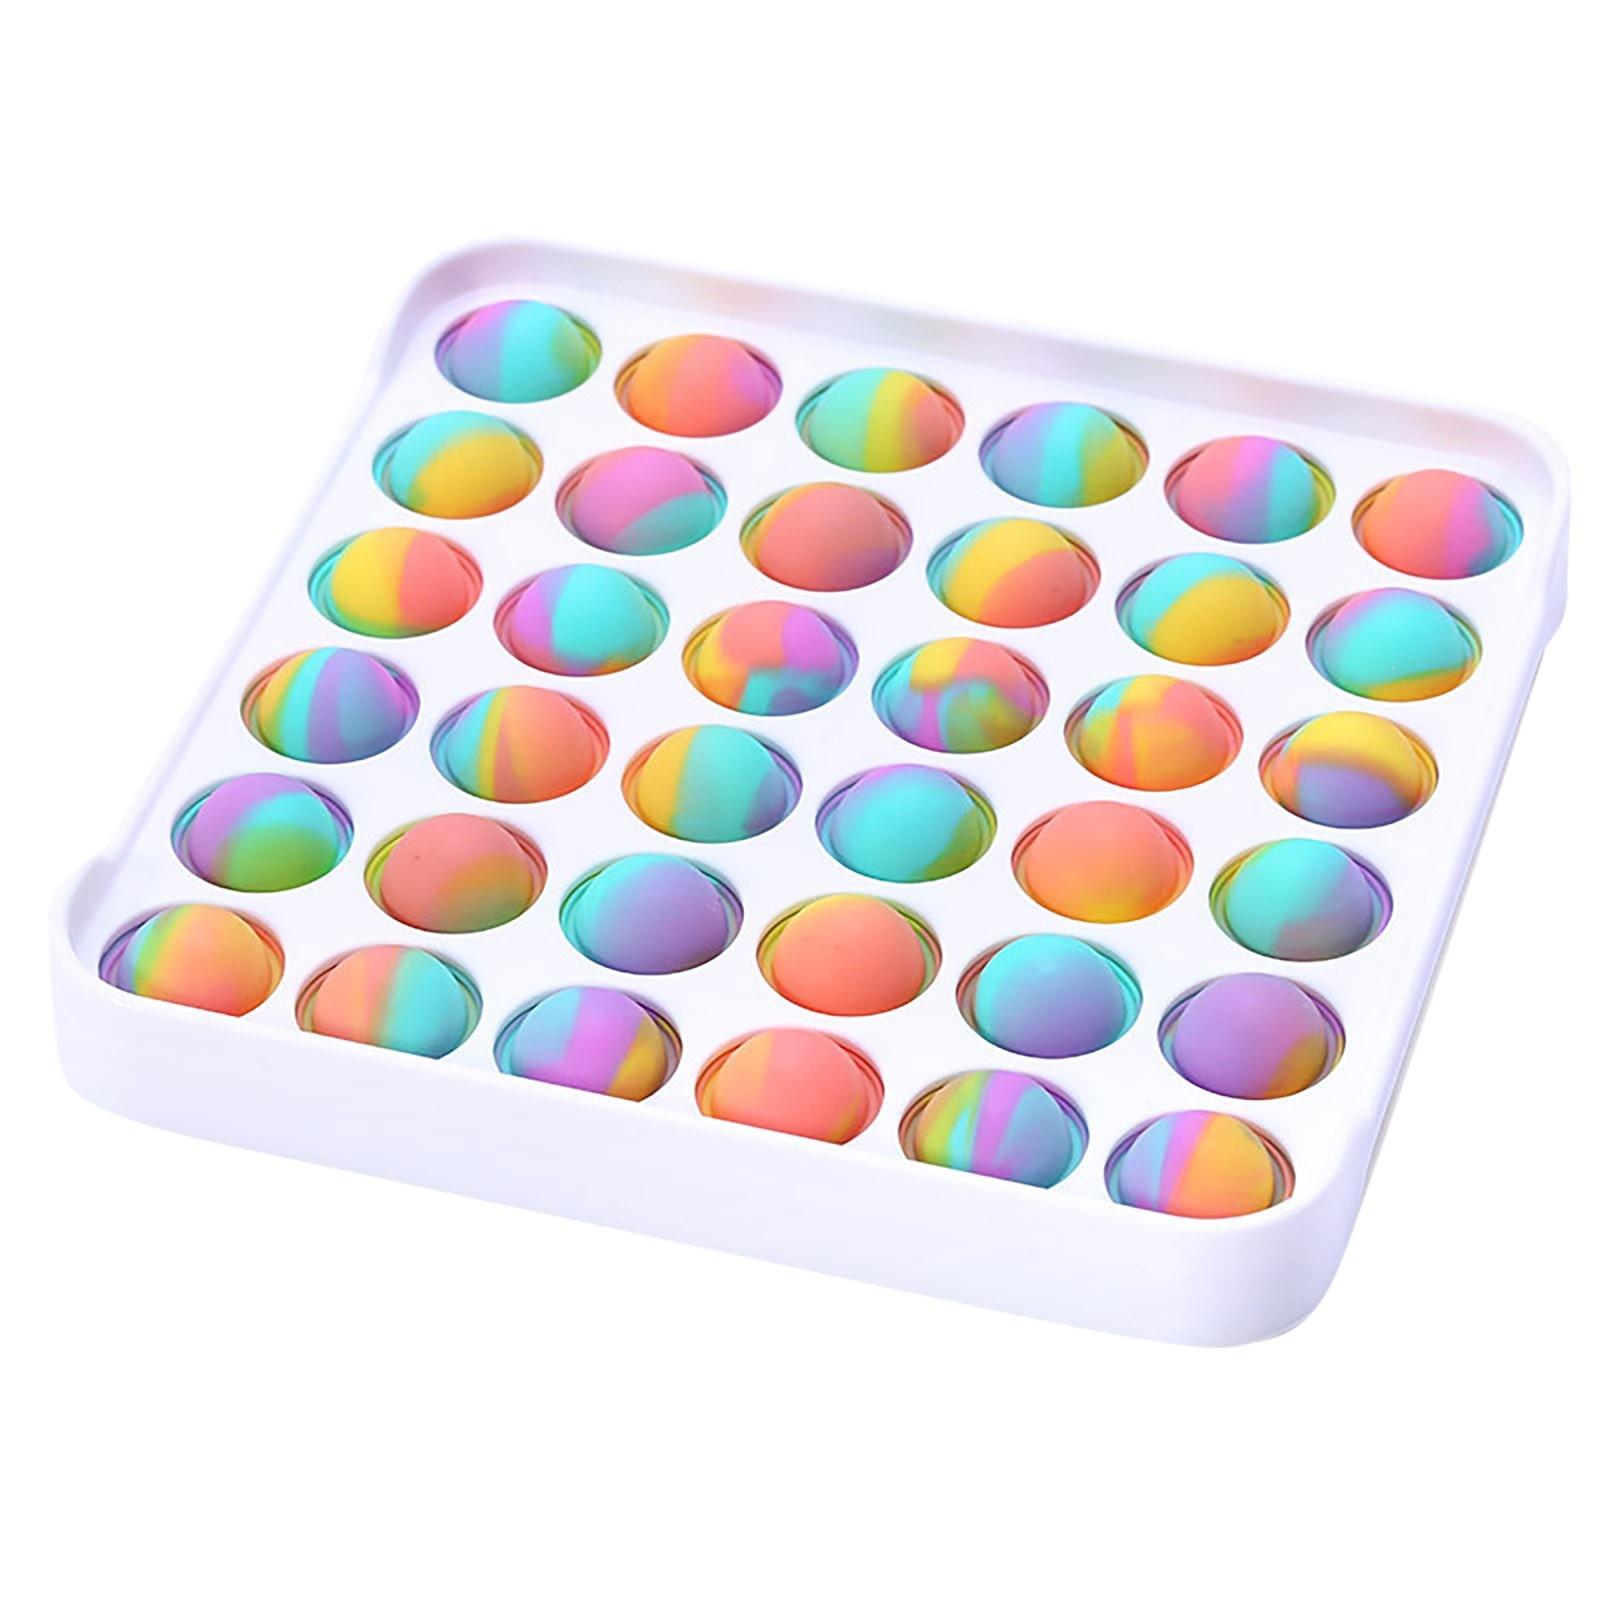 Colorful Push Pops Fidget Bubble Sensory Squishy Stress Reliever Autism Needs Anti-stress Pop-It Rainbow Adult Toys For Children